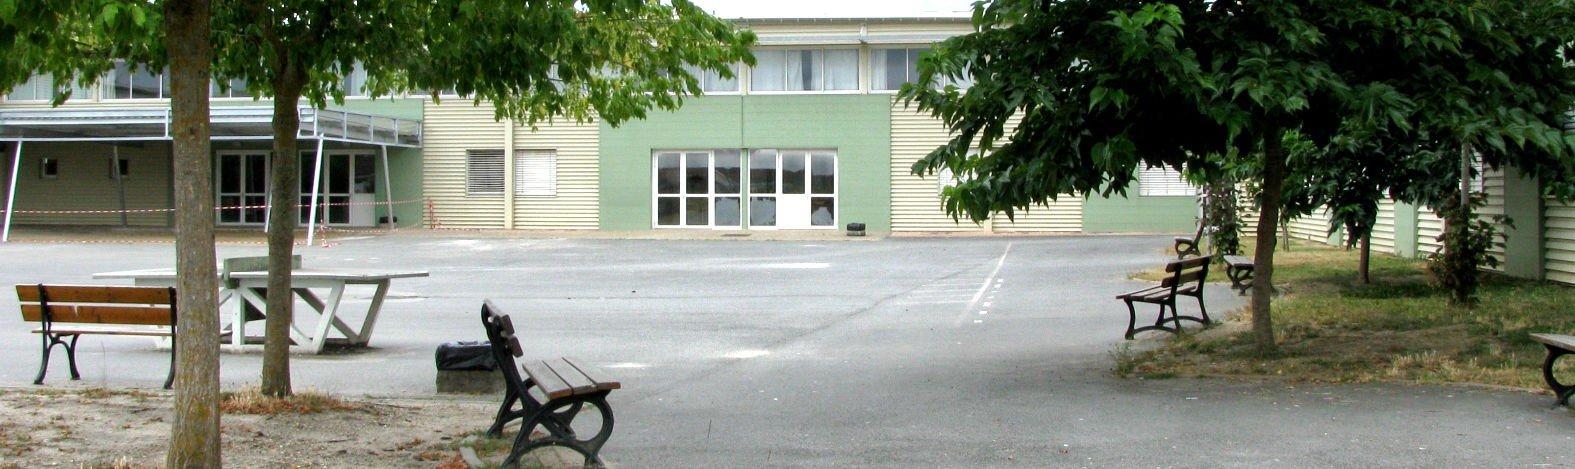 Collège Robert Barriere Sauveterre De Guyenne